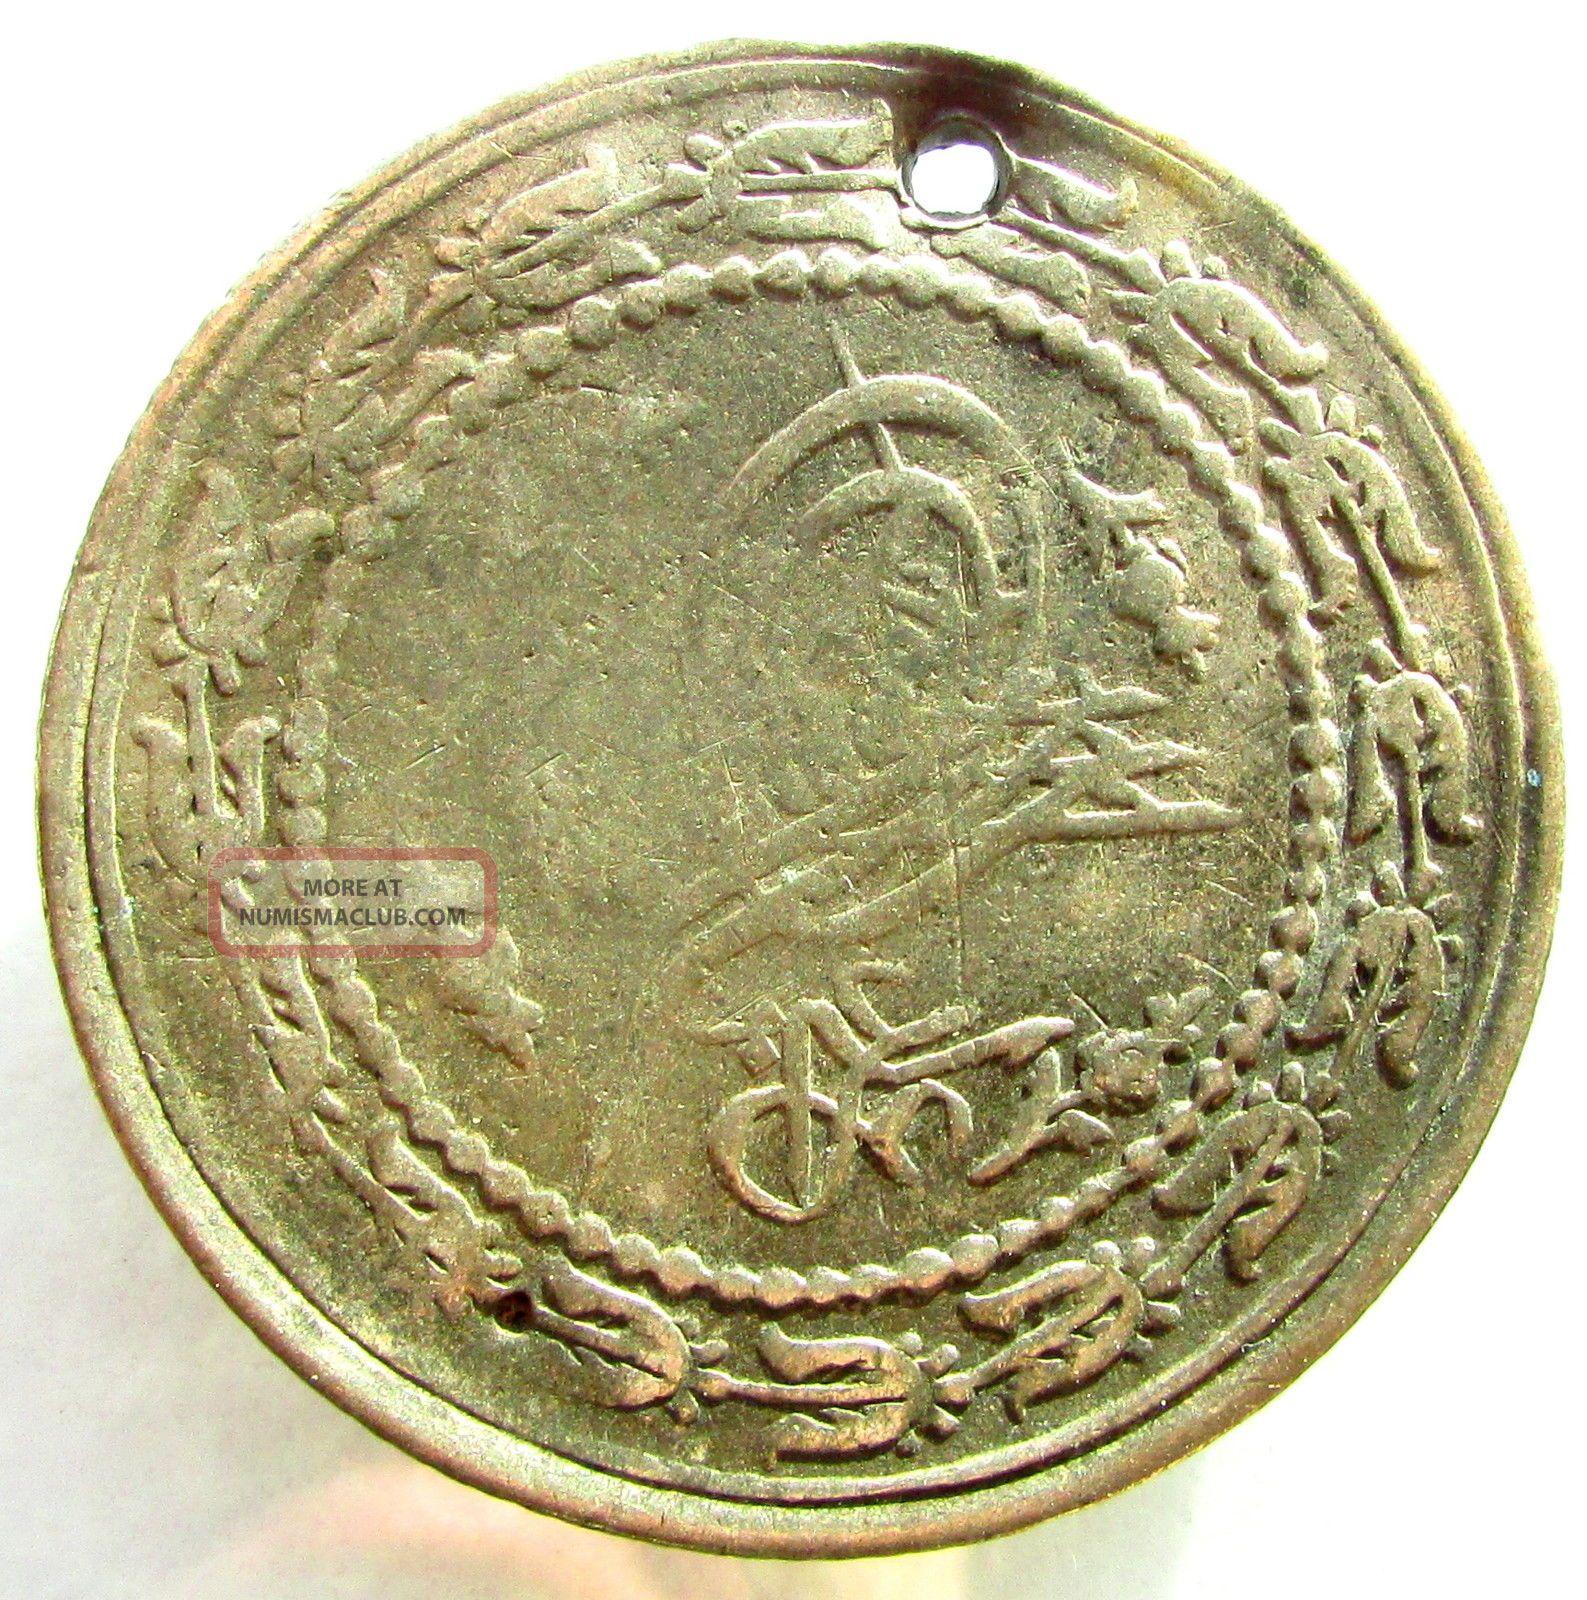 Amp Large Ottoman Islamic Silver Coin Pendant 13 Grams